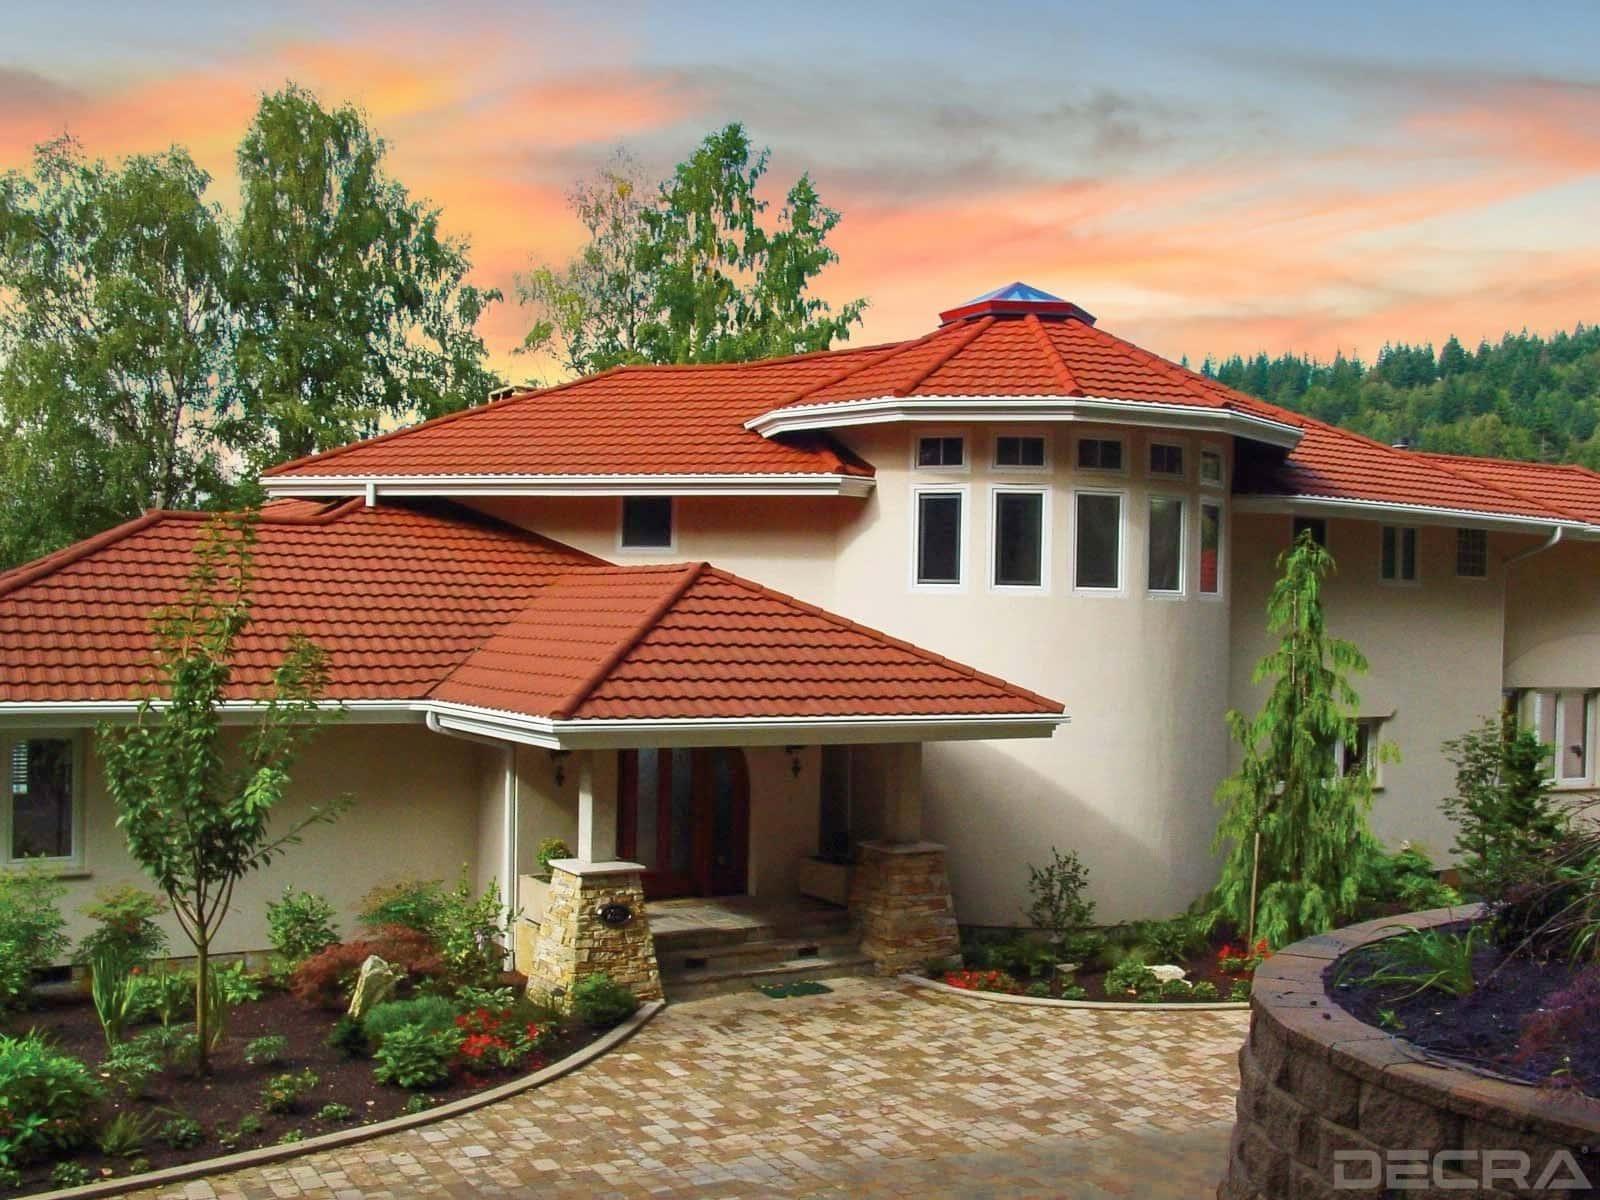 DECRA Tile Terracotta House